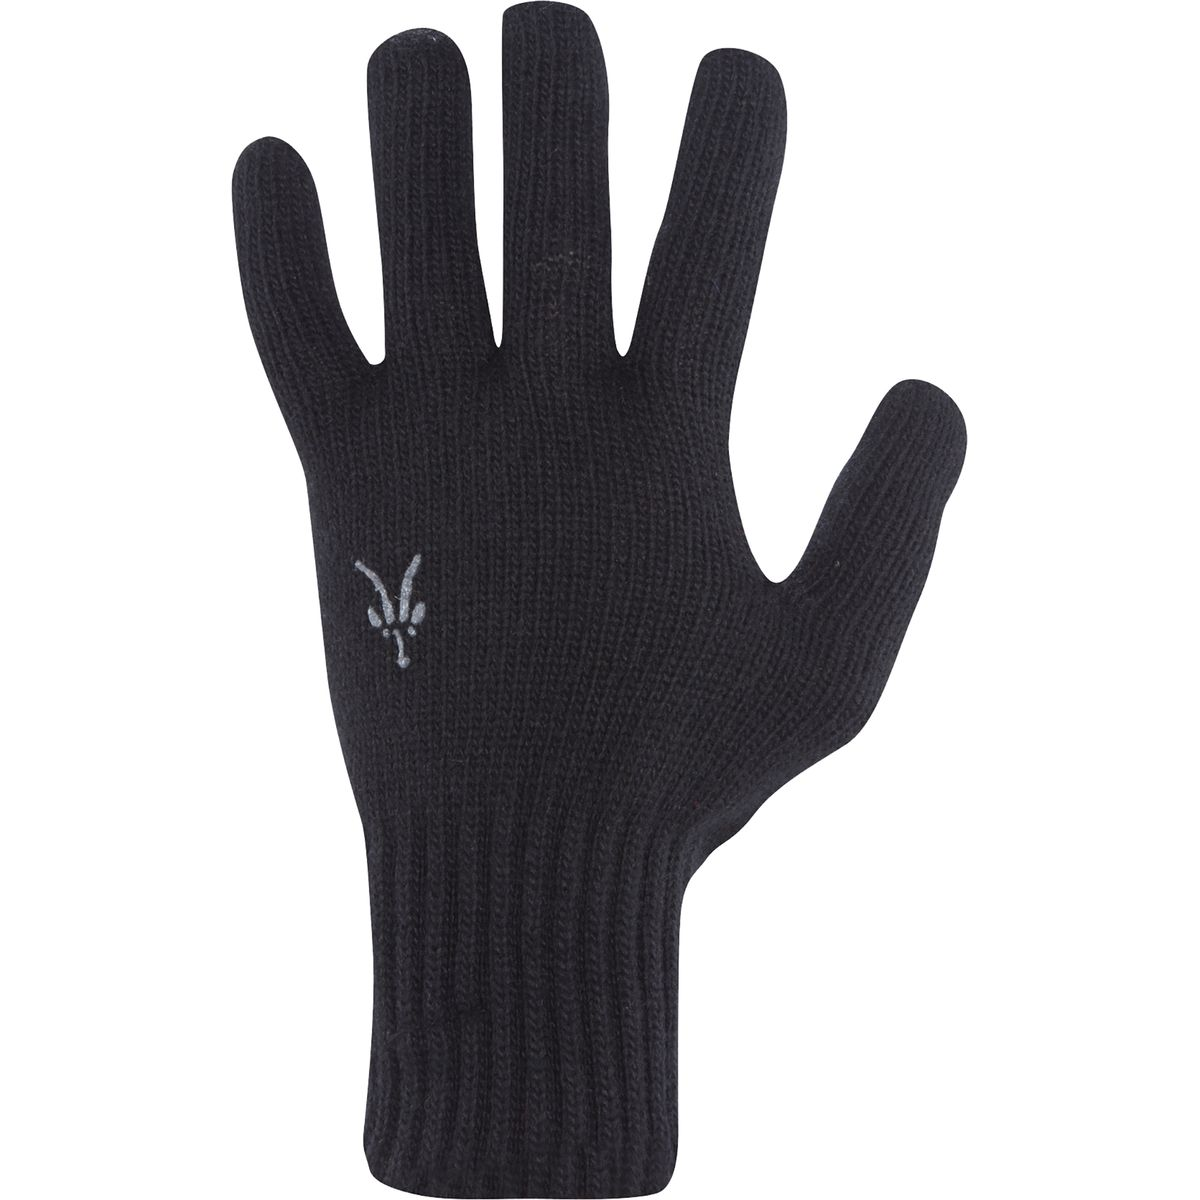 Ibex Knitty Gritty Wool Glove